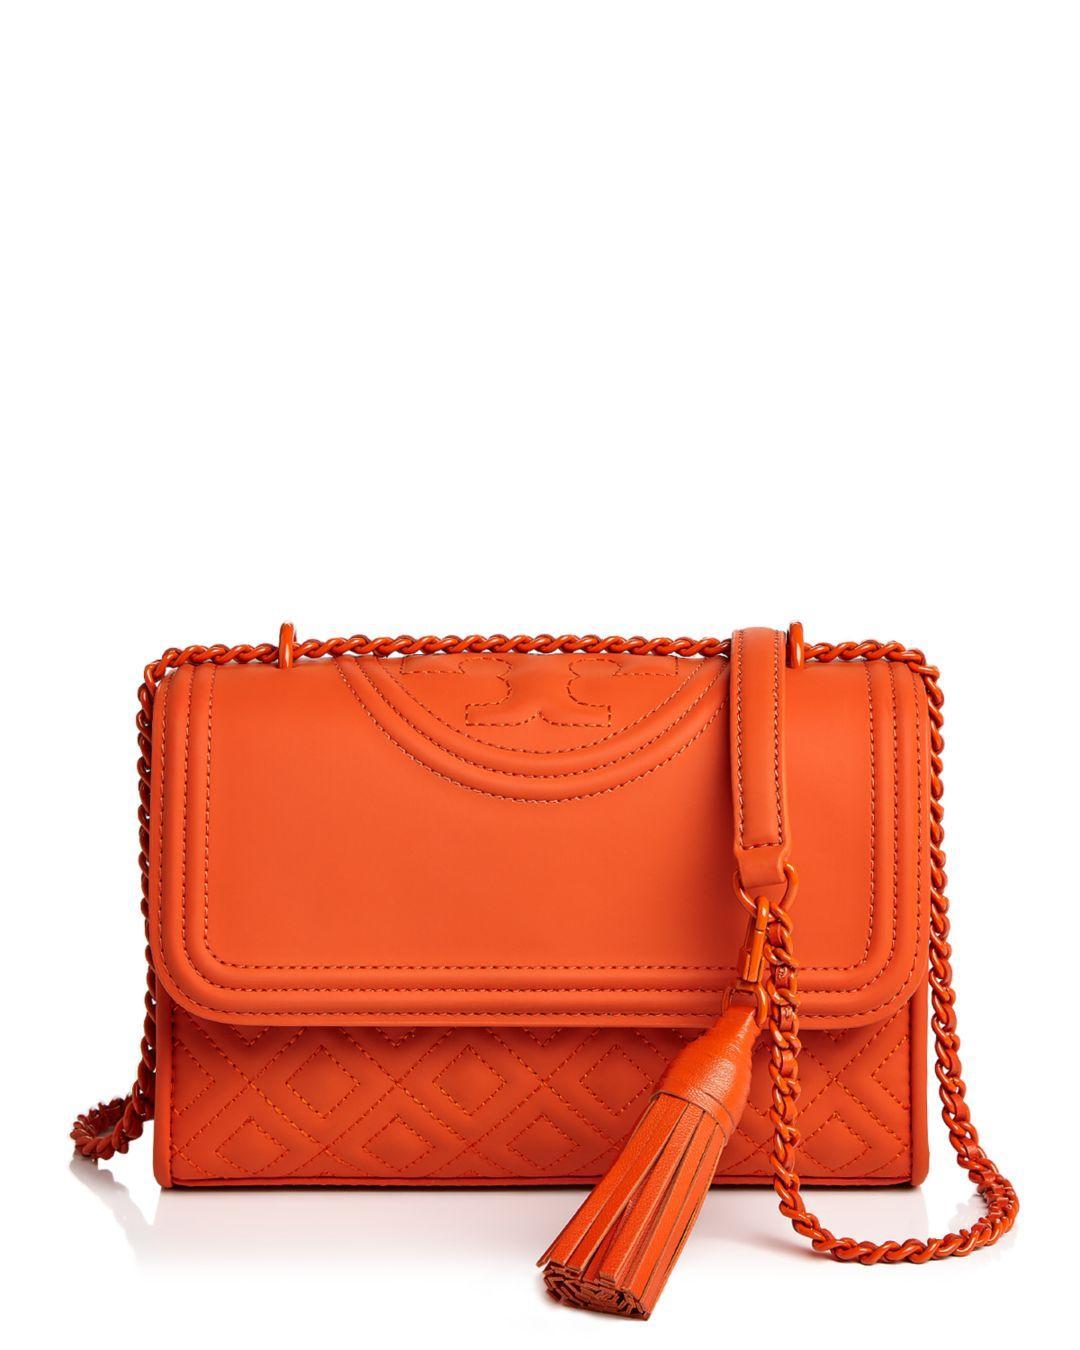 b370b023e51c Tory Burch. Women s Black Fleming Convertible Matte Small Leather Shoulder  Bag